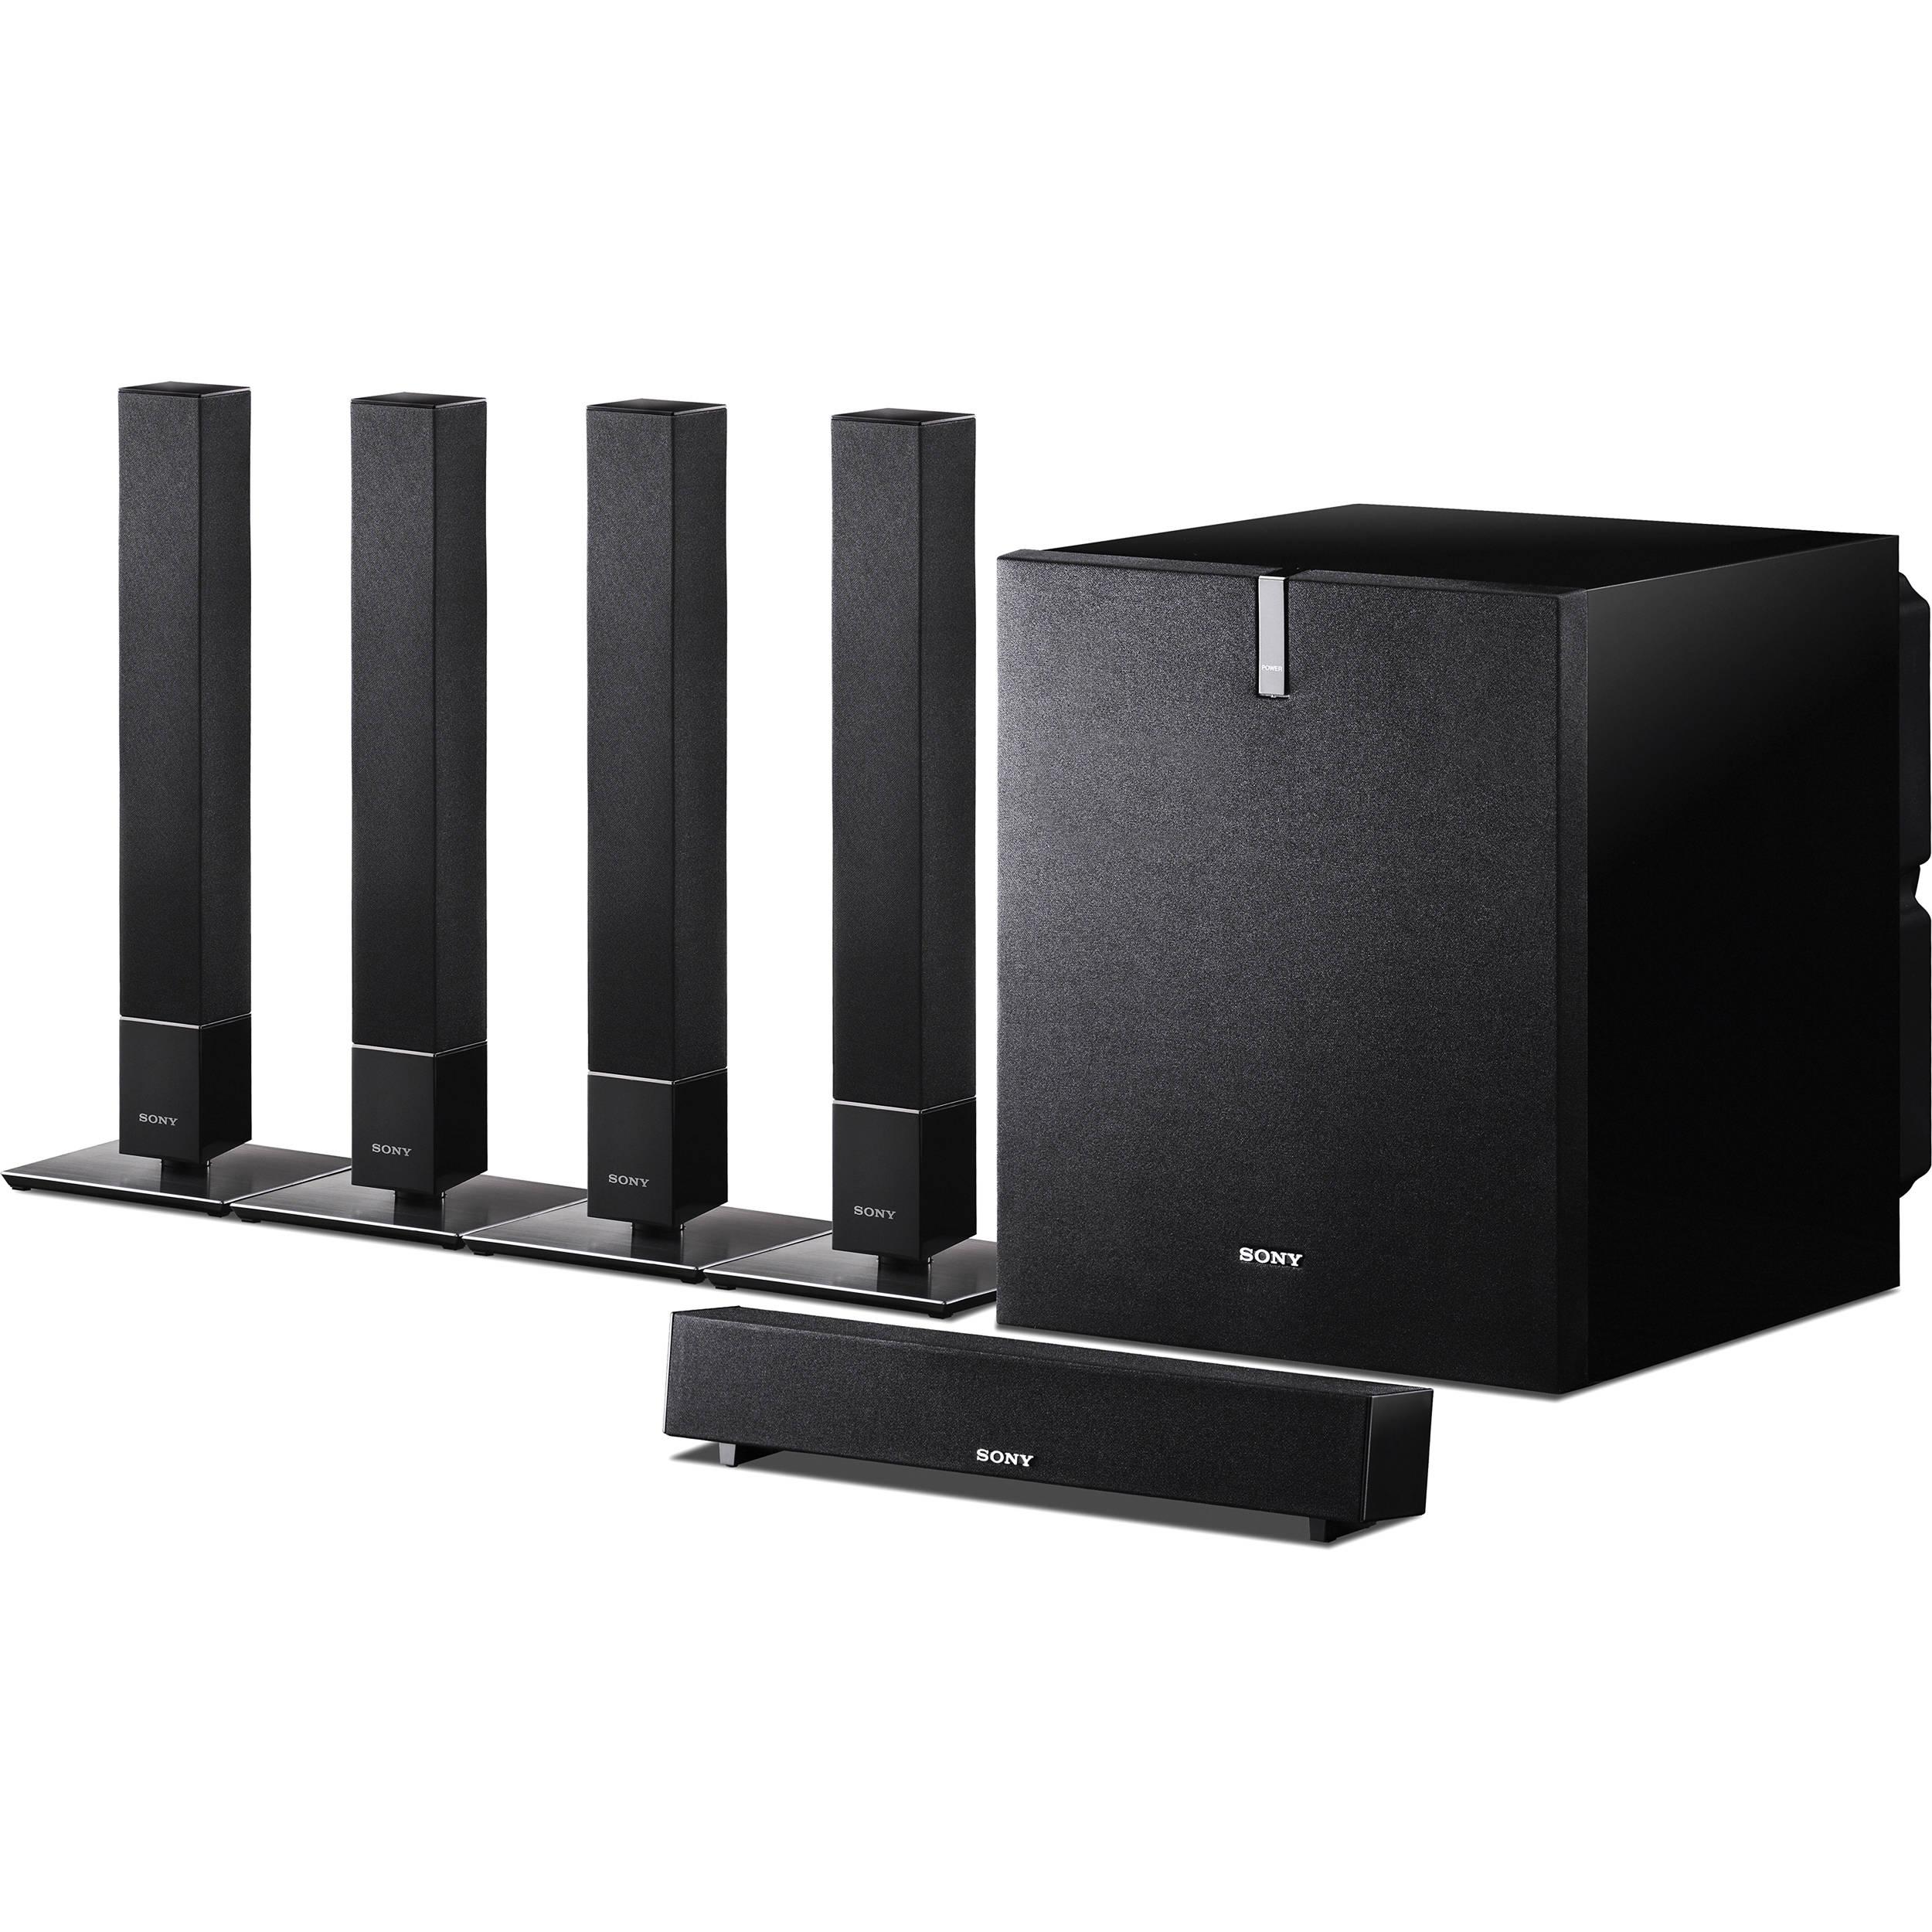 Sony sa-ve815ed 5 1 home theater speaker system ya-sbr510